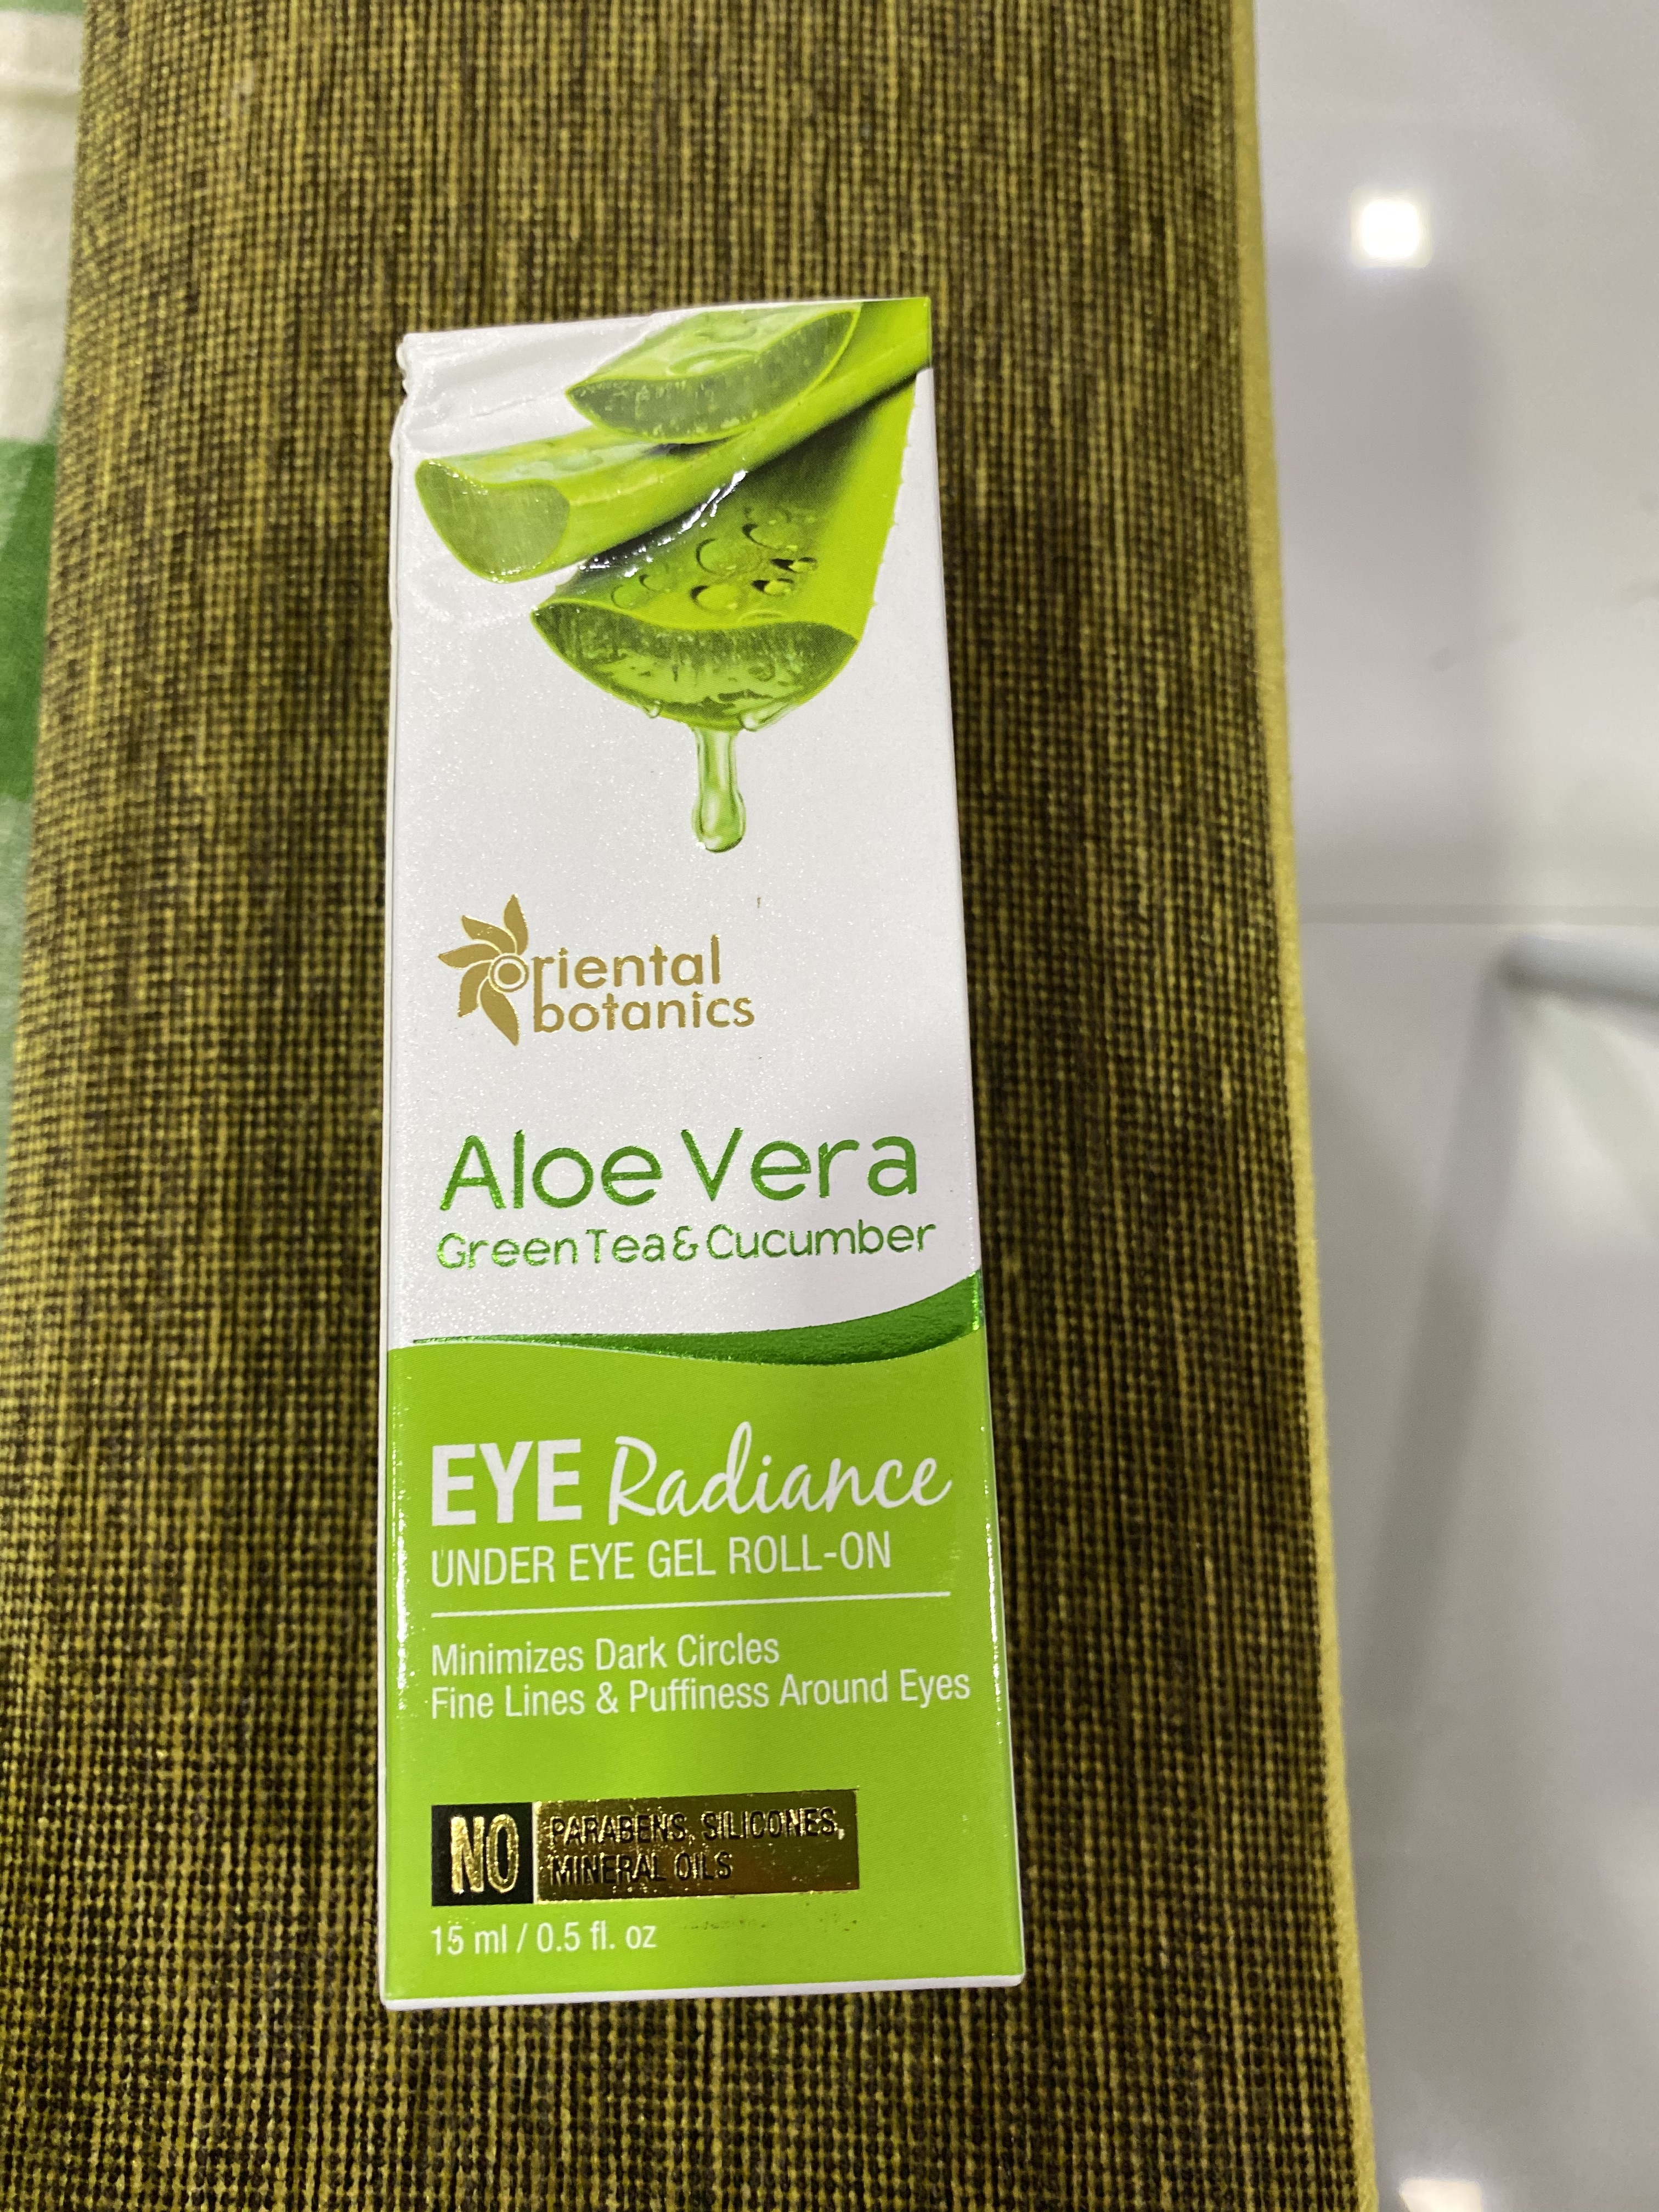 Oriental Botanics 99% Aloe Vera Fresh Soothing Gel For Skin & Hair-Rejuvenate the skin with fresh aloe Vera-By viralivyas-2